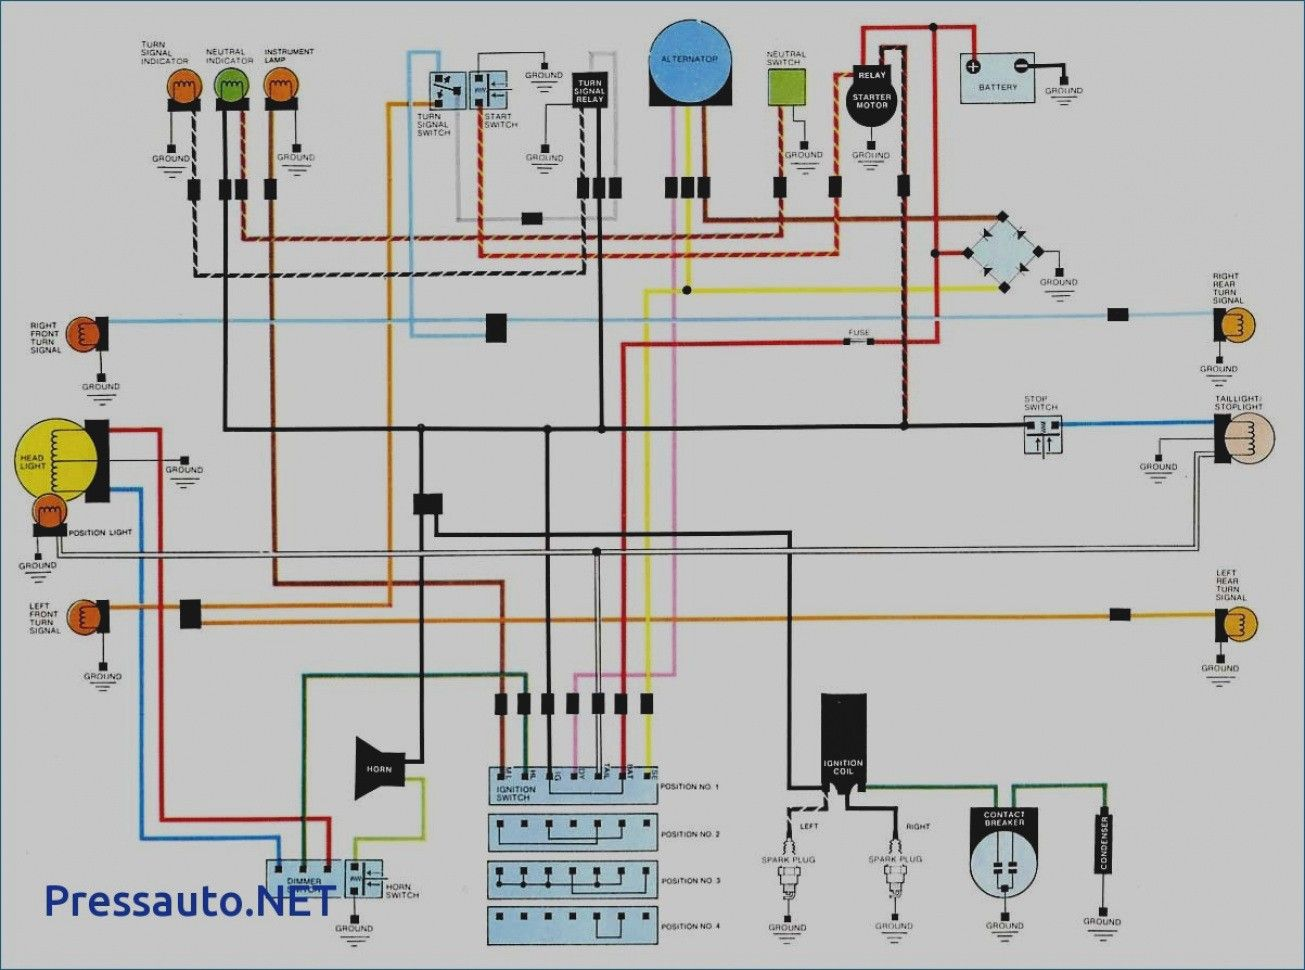 15 Simple Wiring Diagram Of Motorcycle Honda Xrm 125 Technique   S     Bacamajalah Com  15